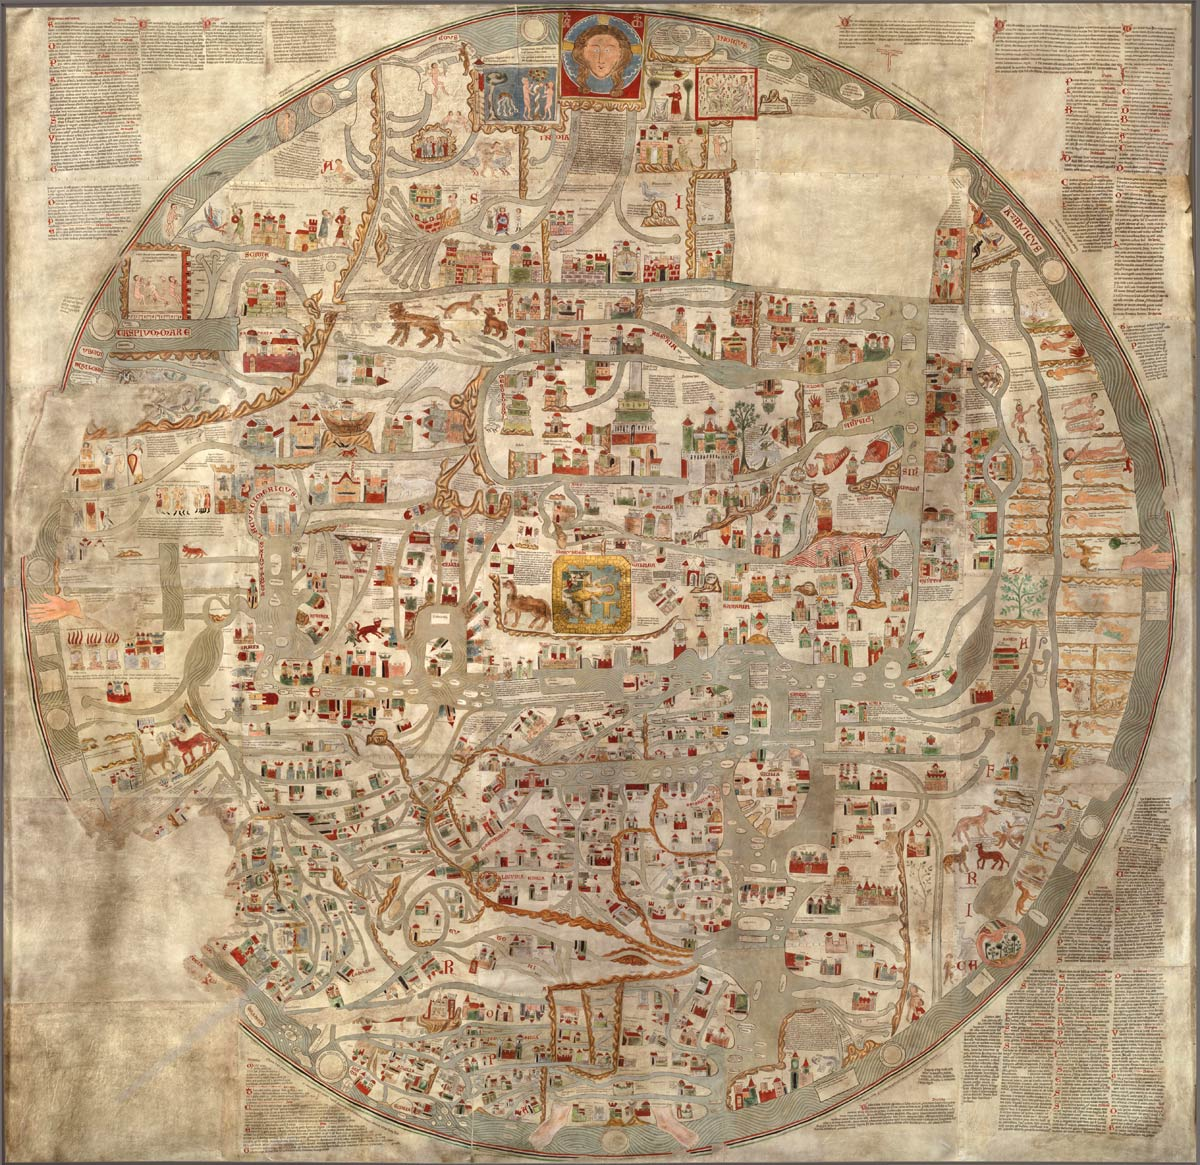 die ebstorfer weltkarte museum lüneburg | Kulturgeschichtliche Objekte: Ebstorfer Weltkarte